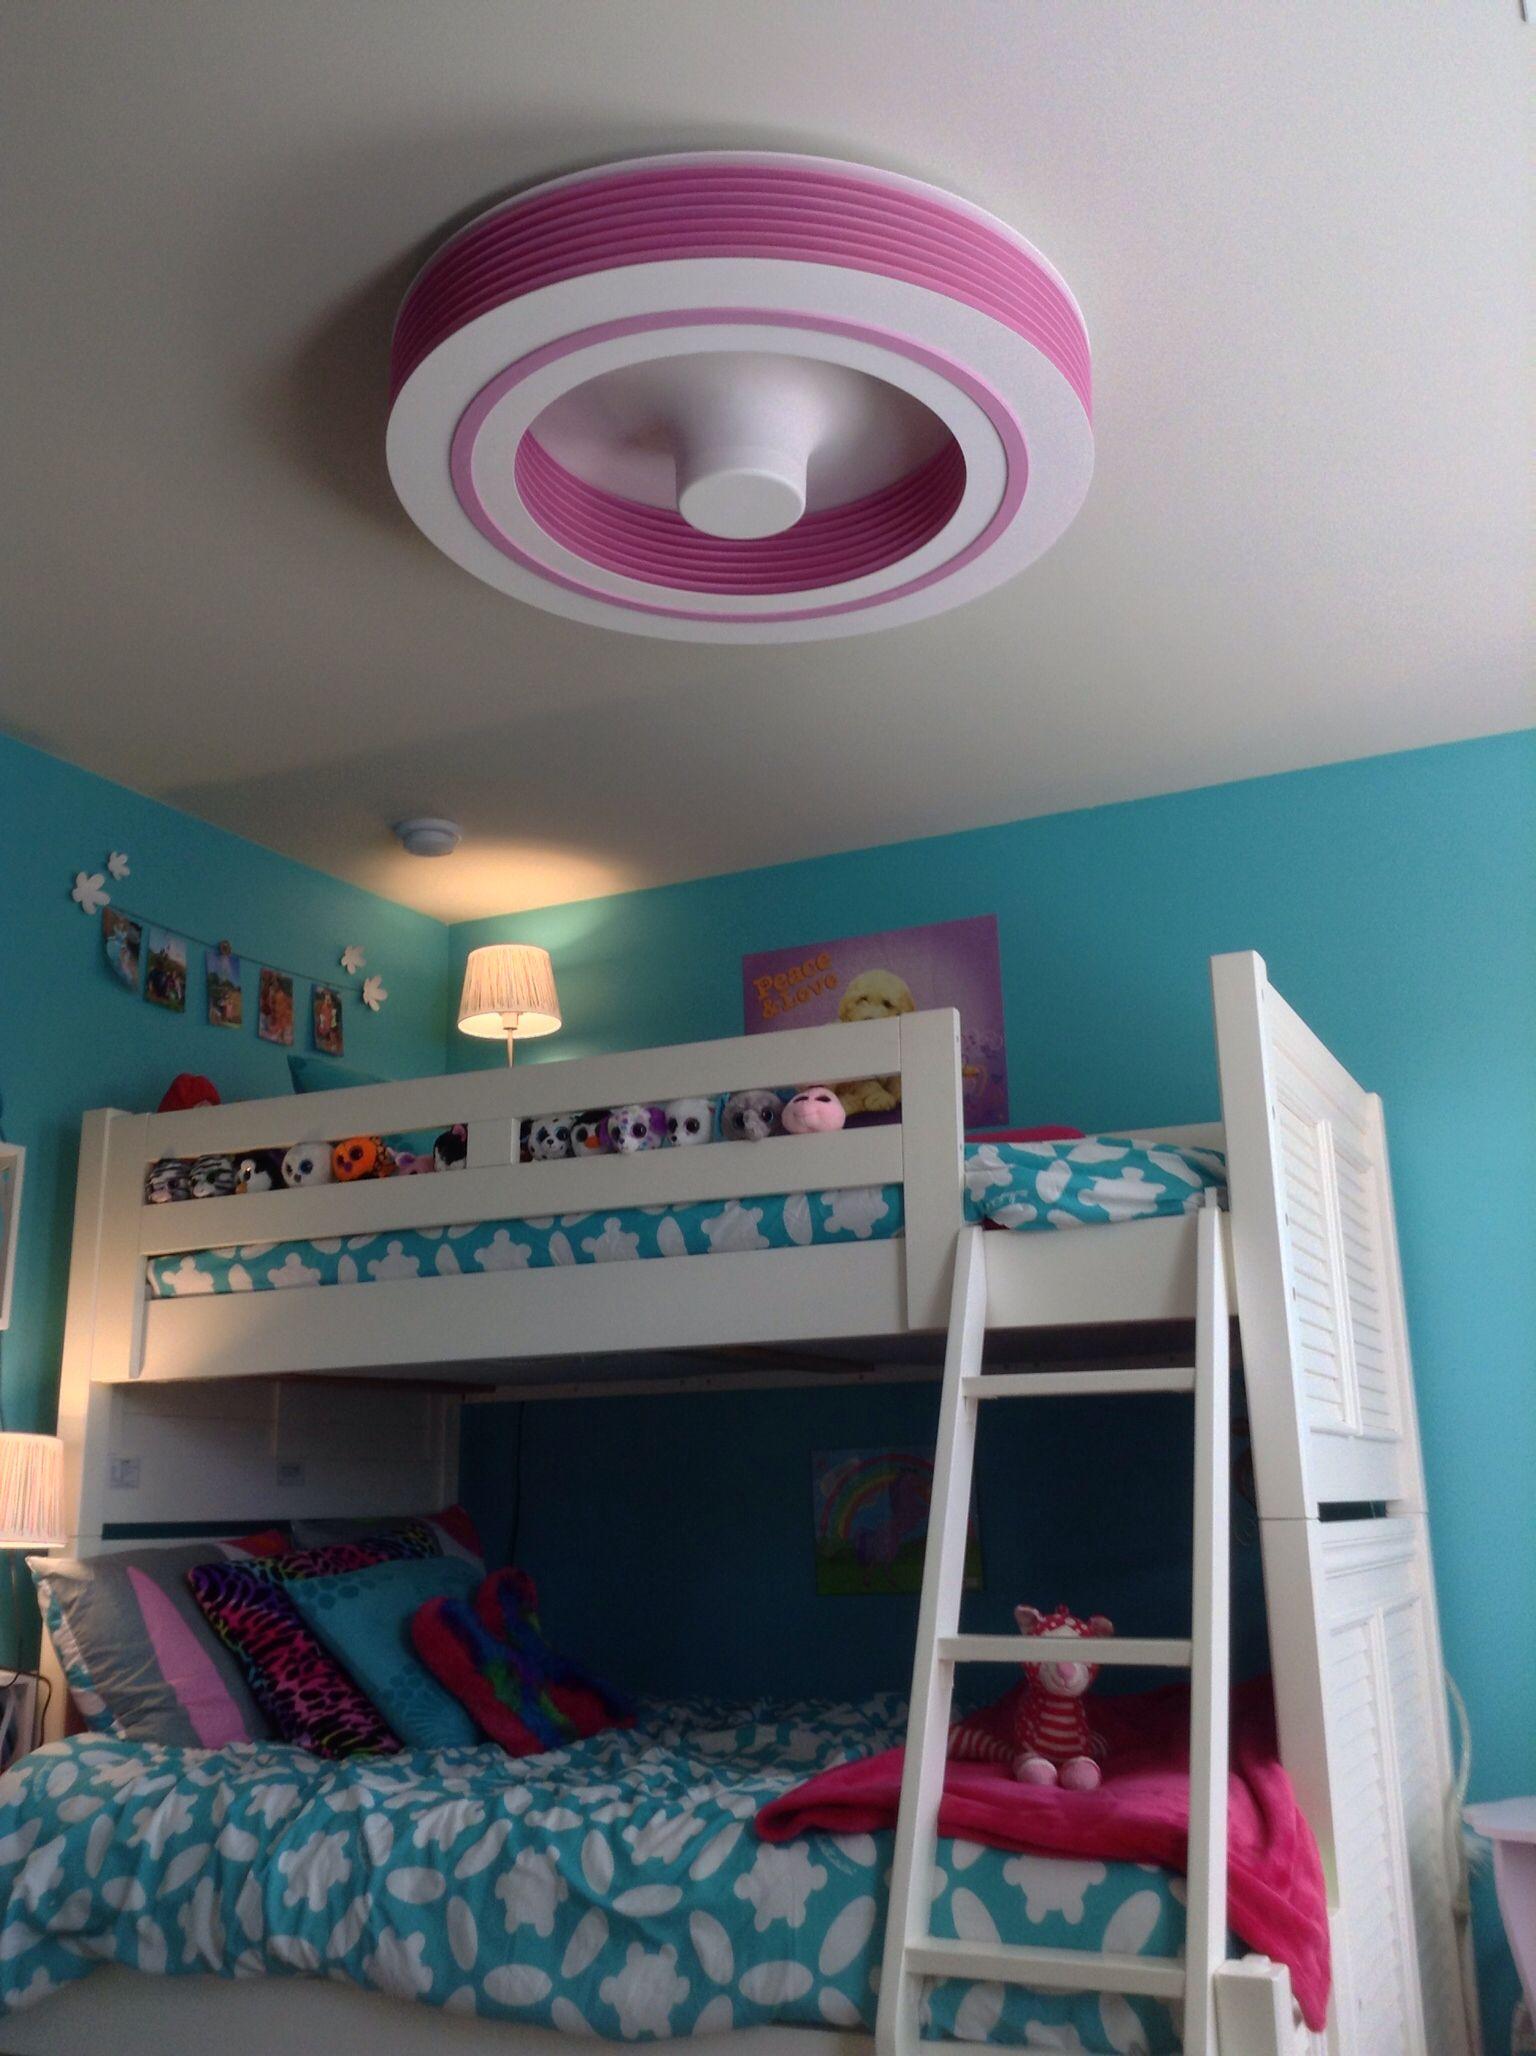 10 Unique Ceiling Fans Boys Room Ceiling Fan Girls Room Kids